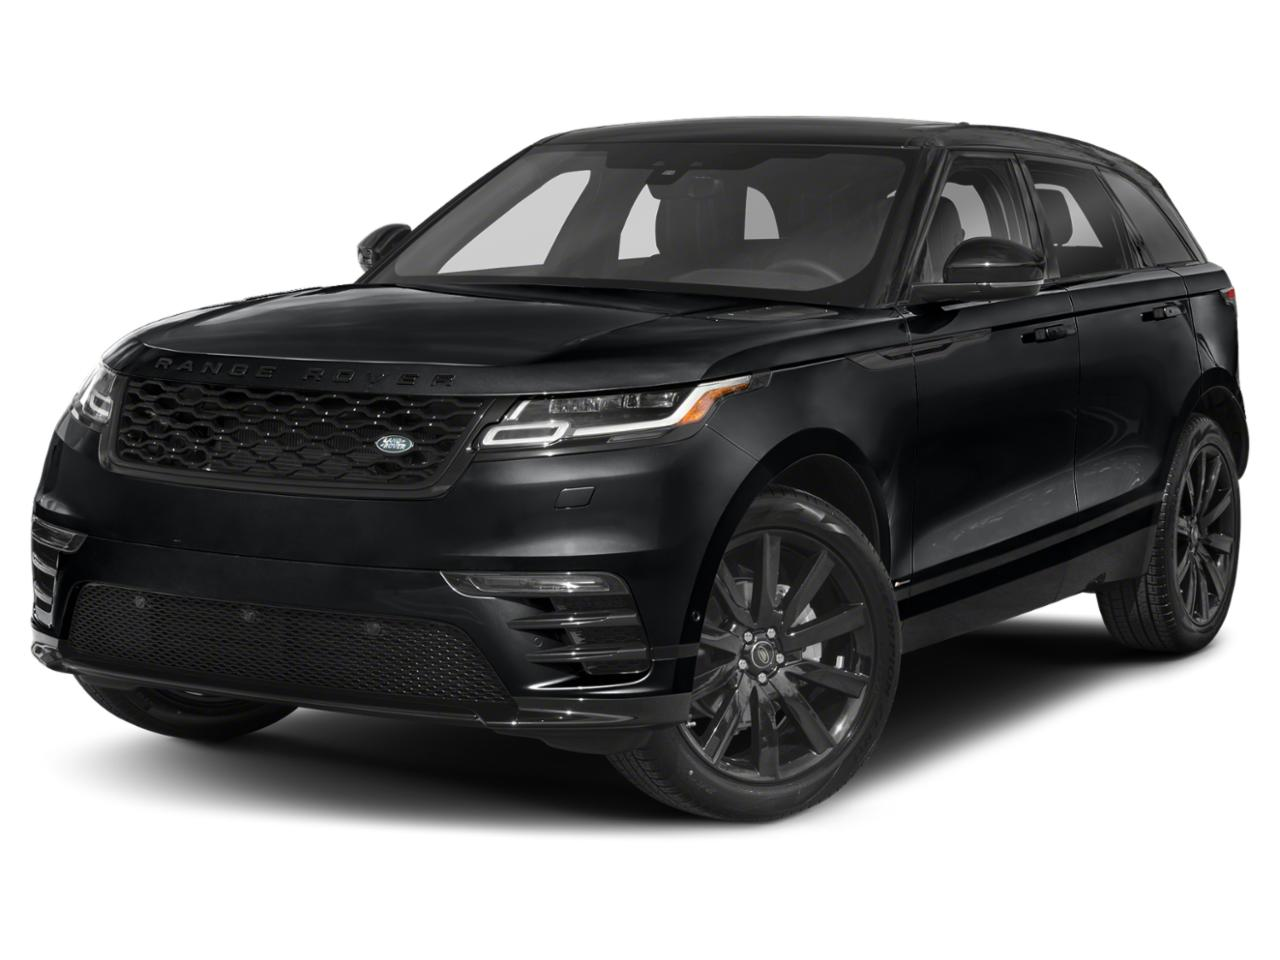 2018 Land Rover Range Rover Velar Vehicle Photo in San Antonio, TX 78254